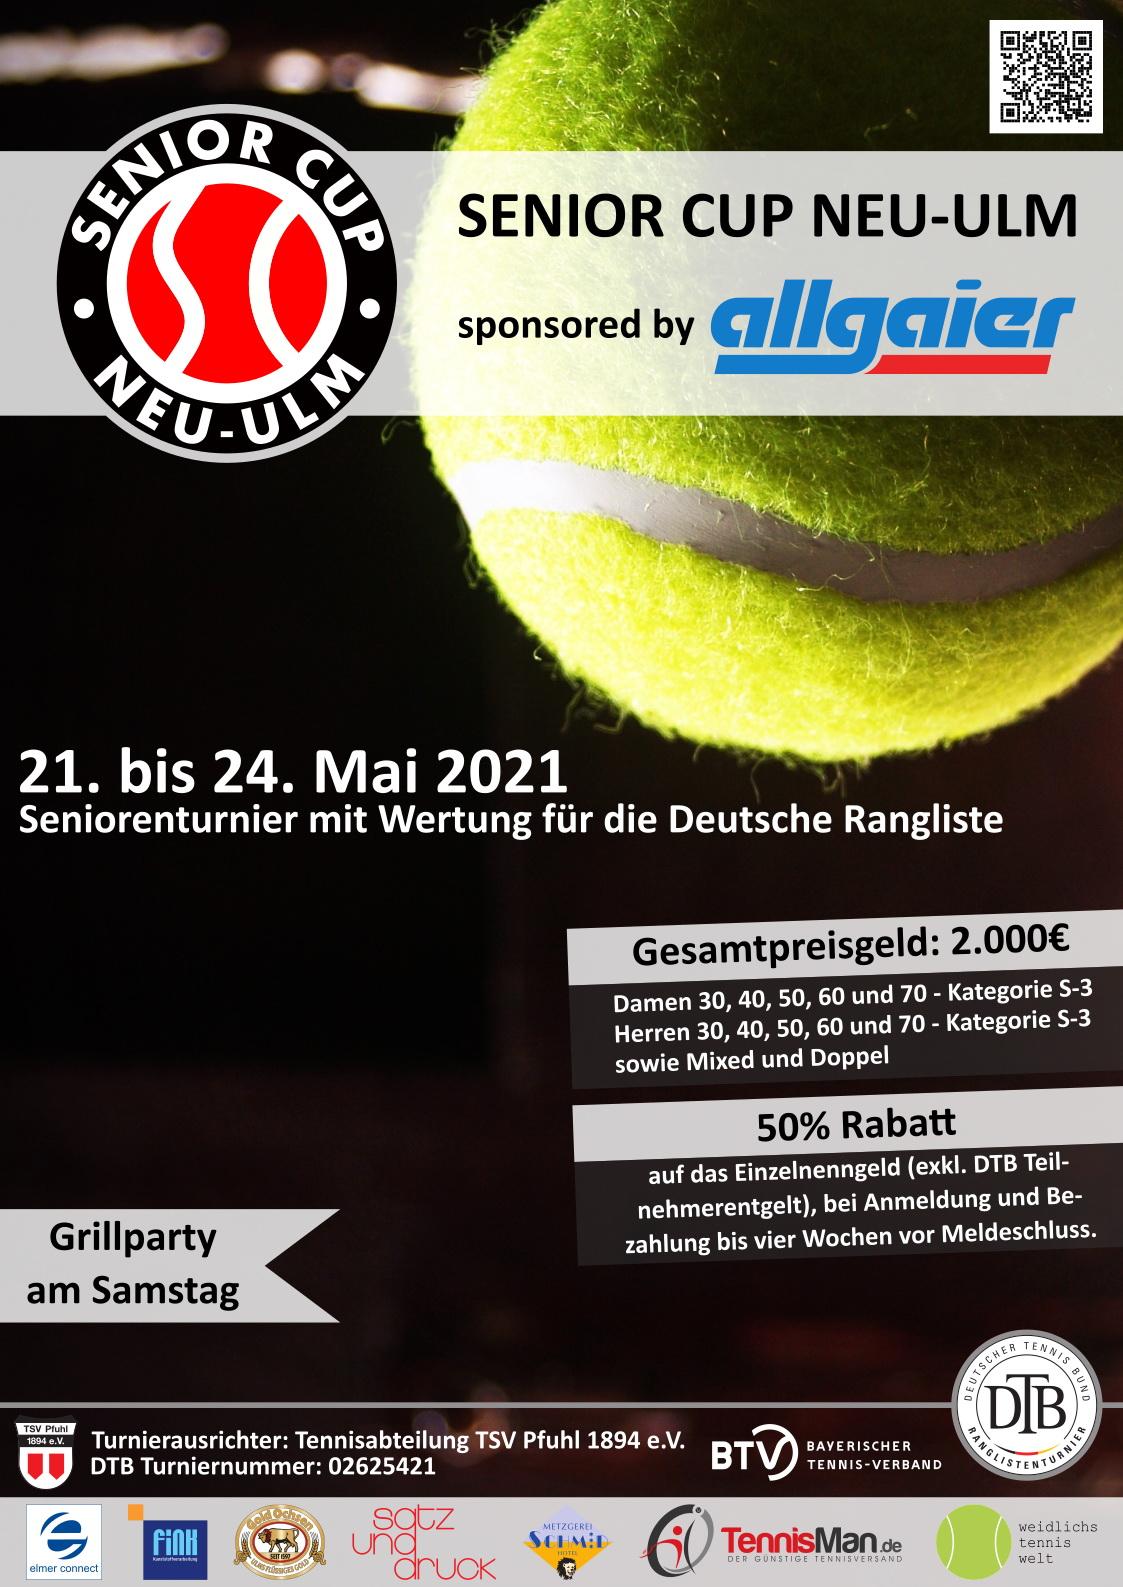 Senior Cup Neu-Ulm 2021 sponsored by allgaier